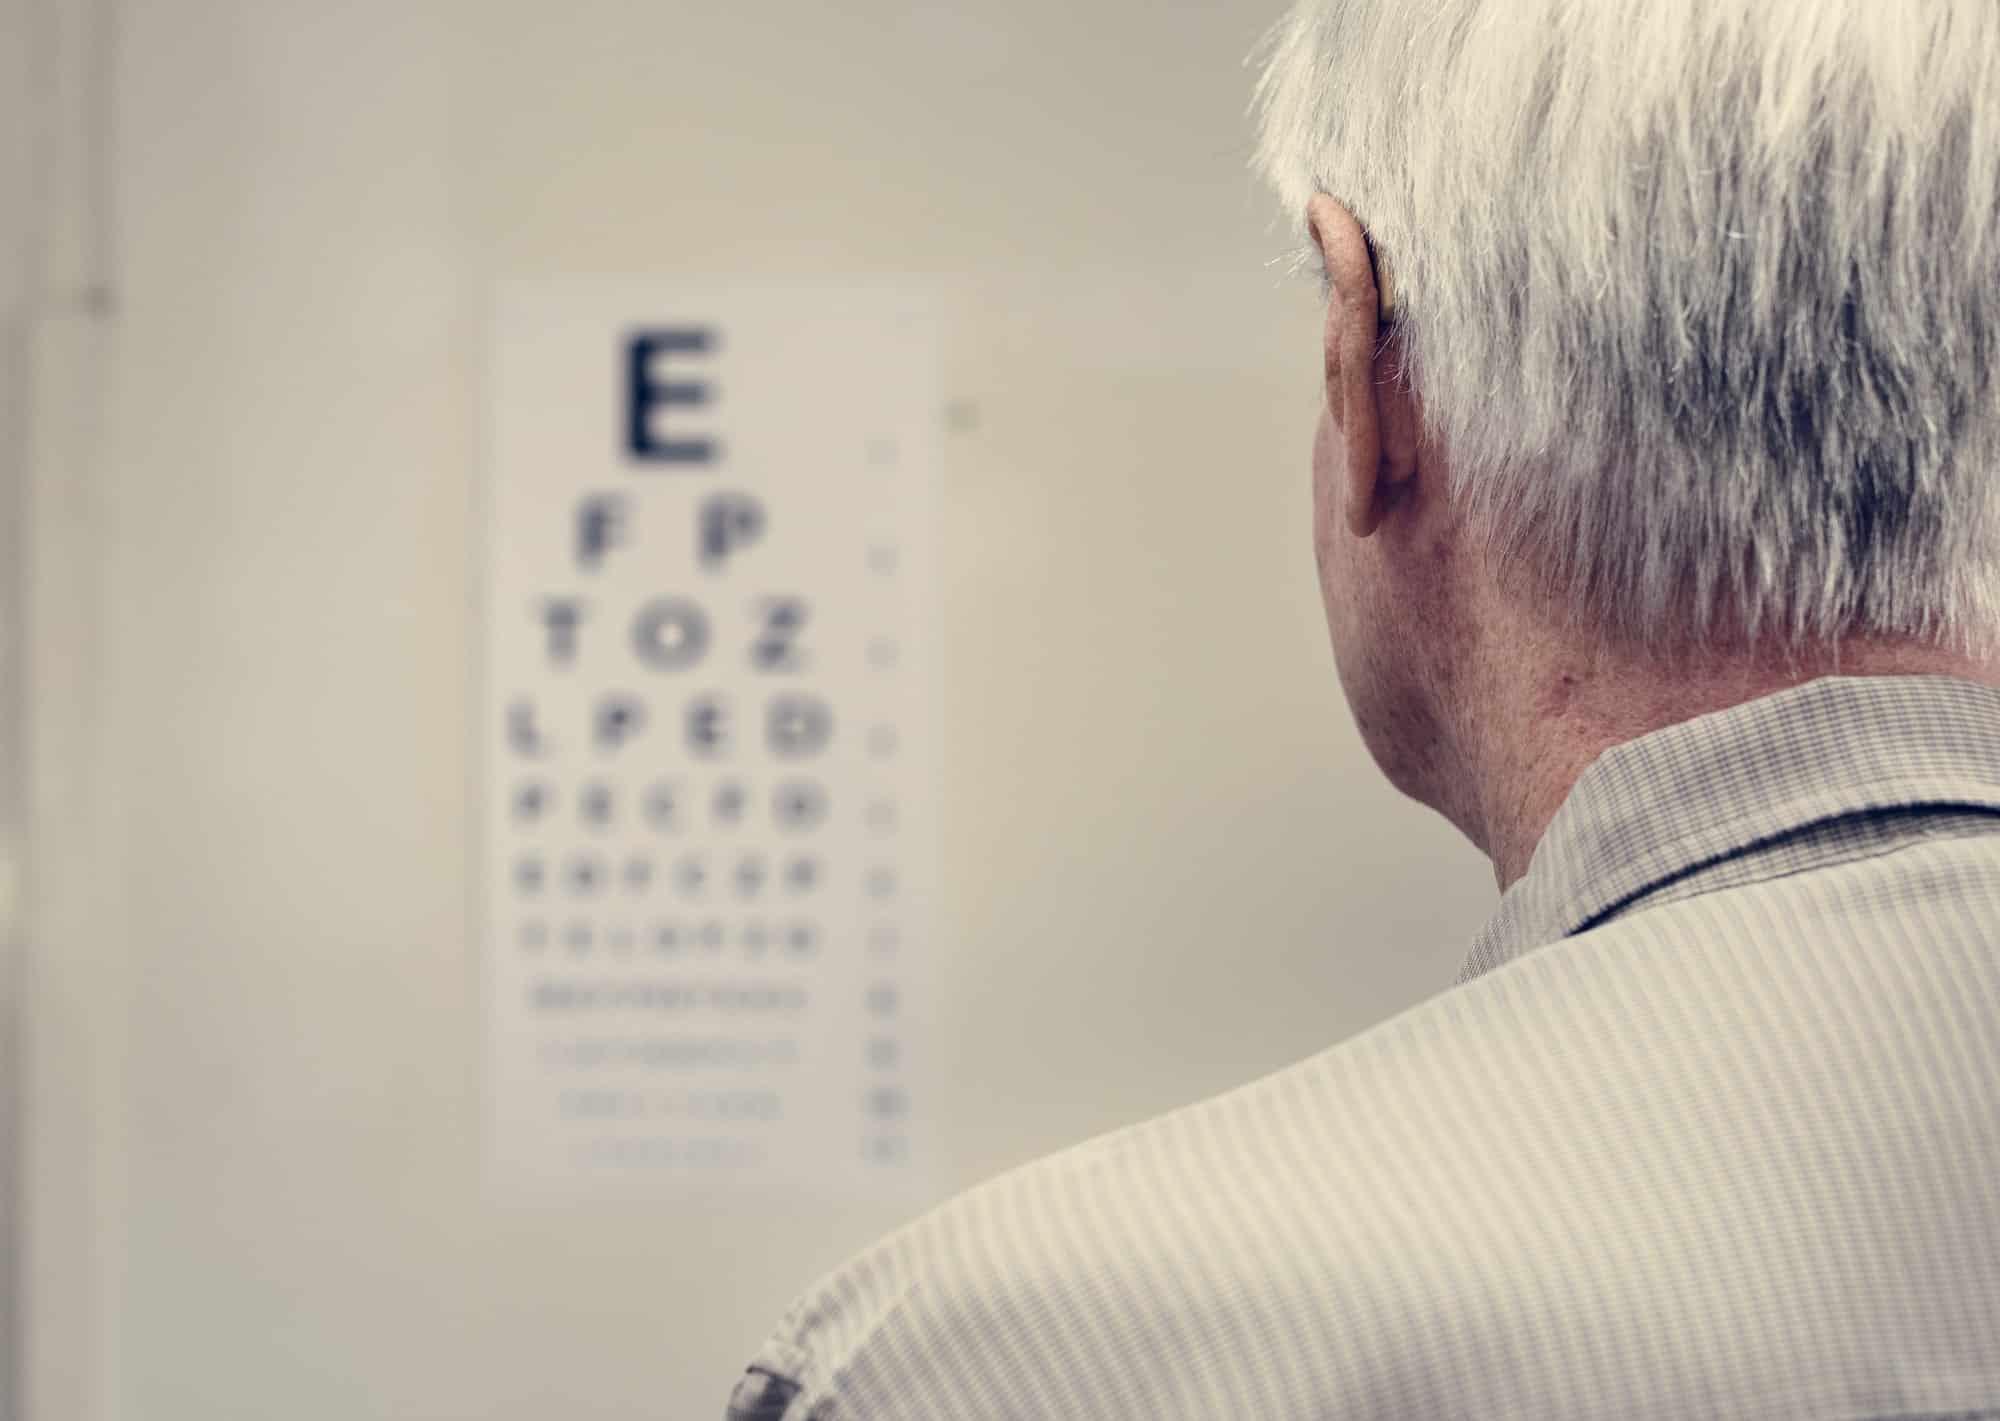 An elderly patient is having sight testing